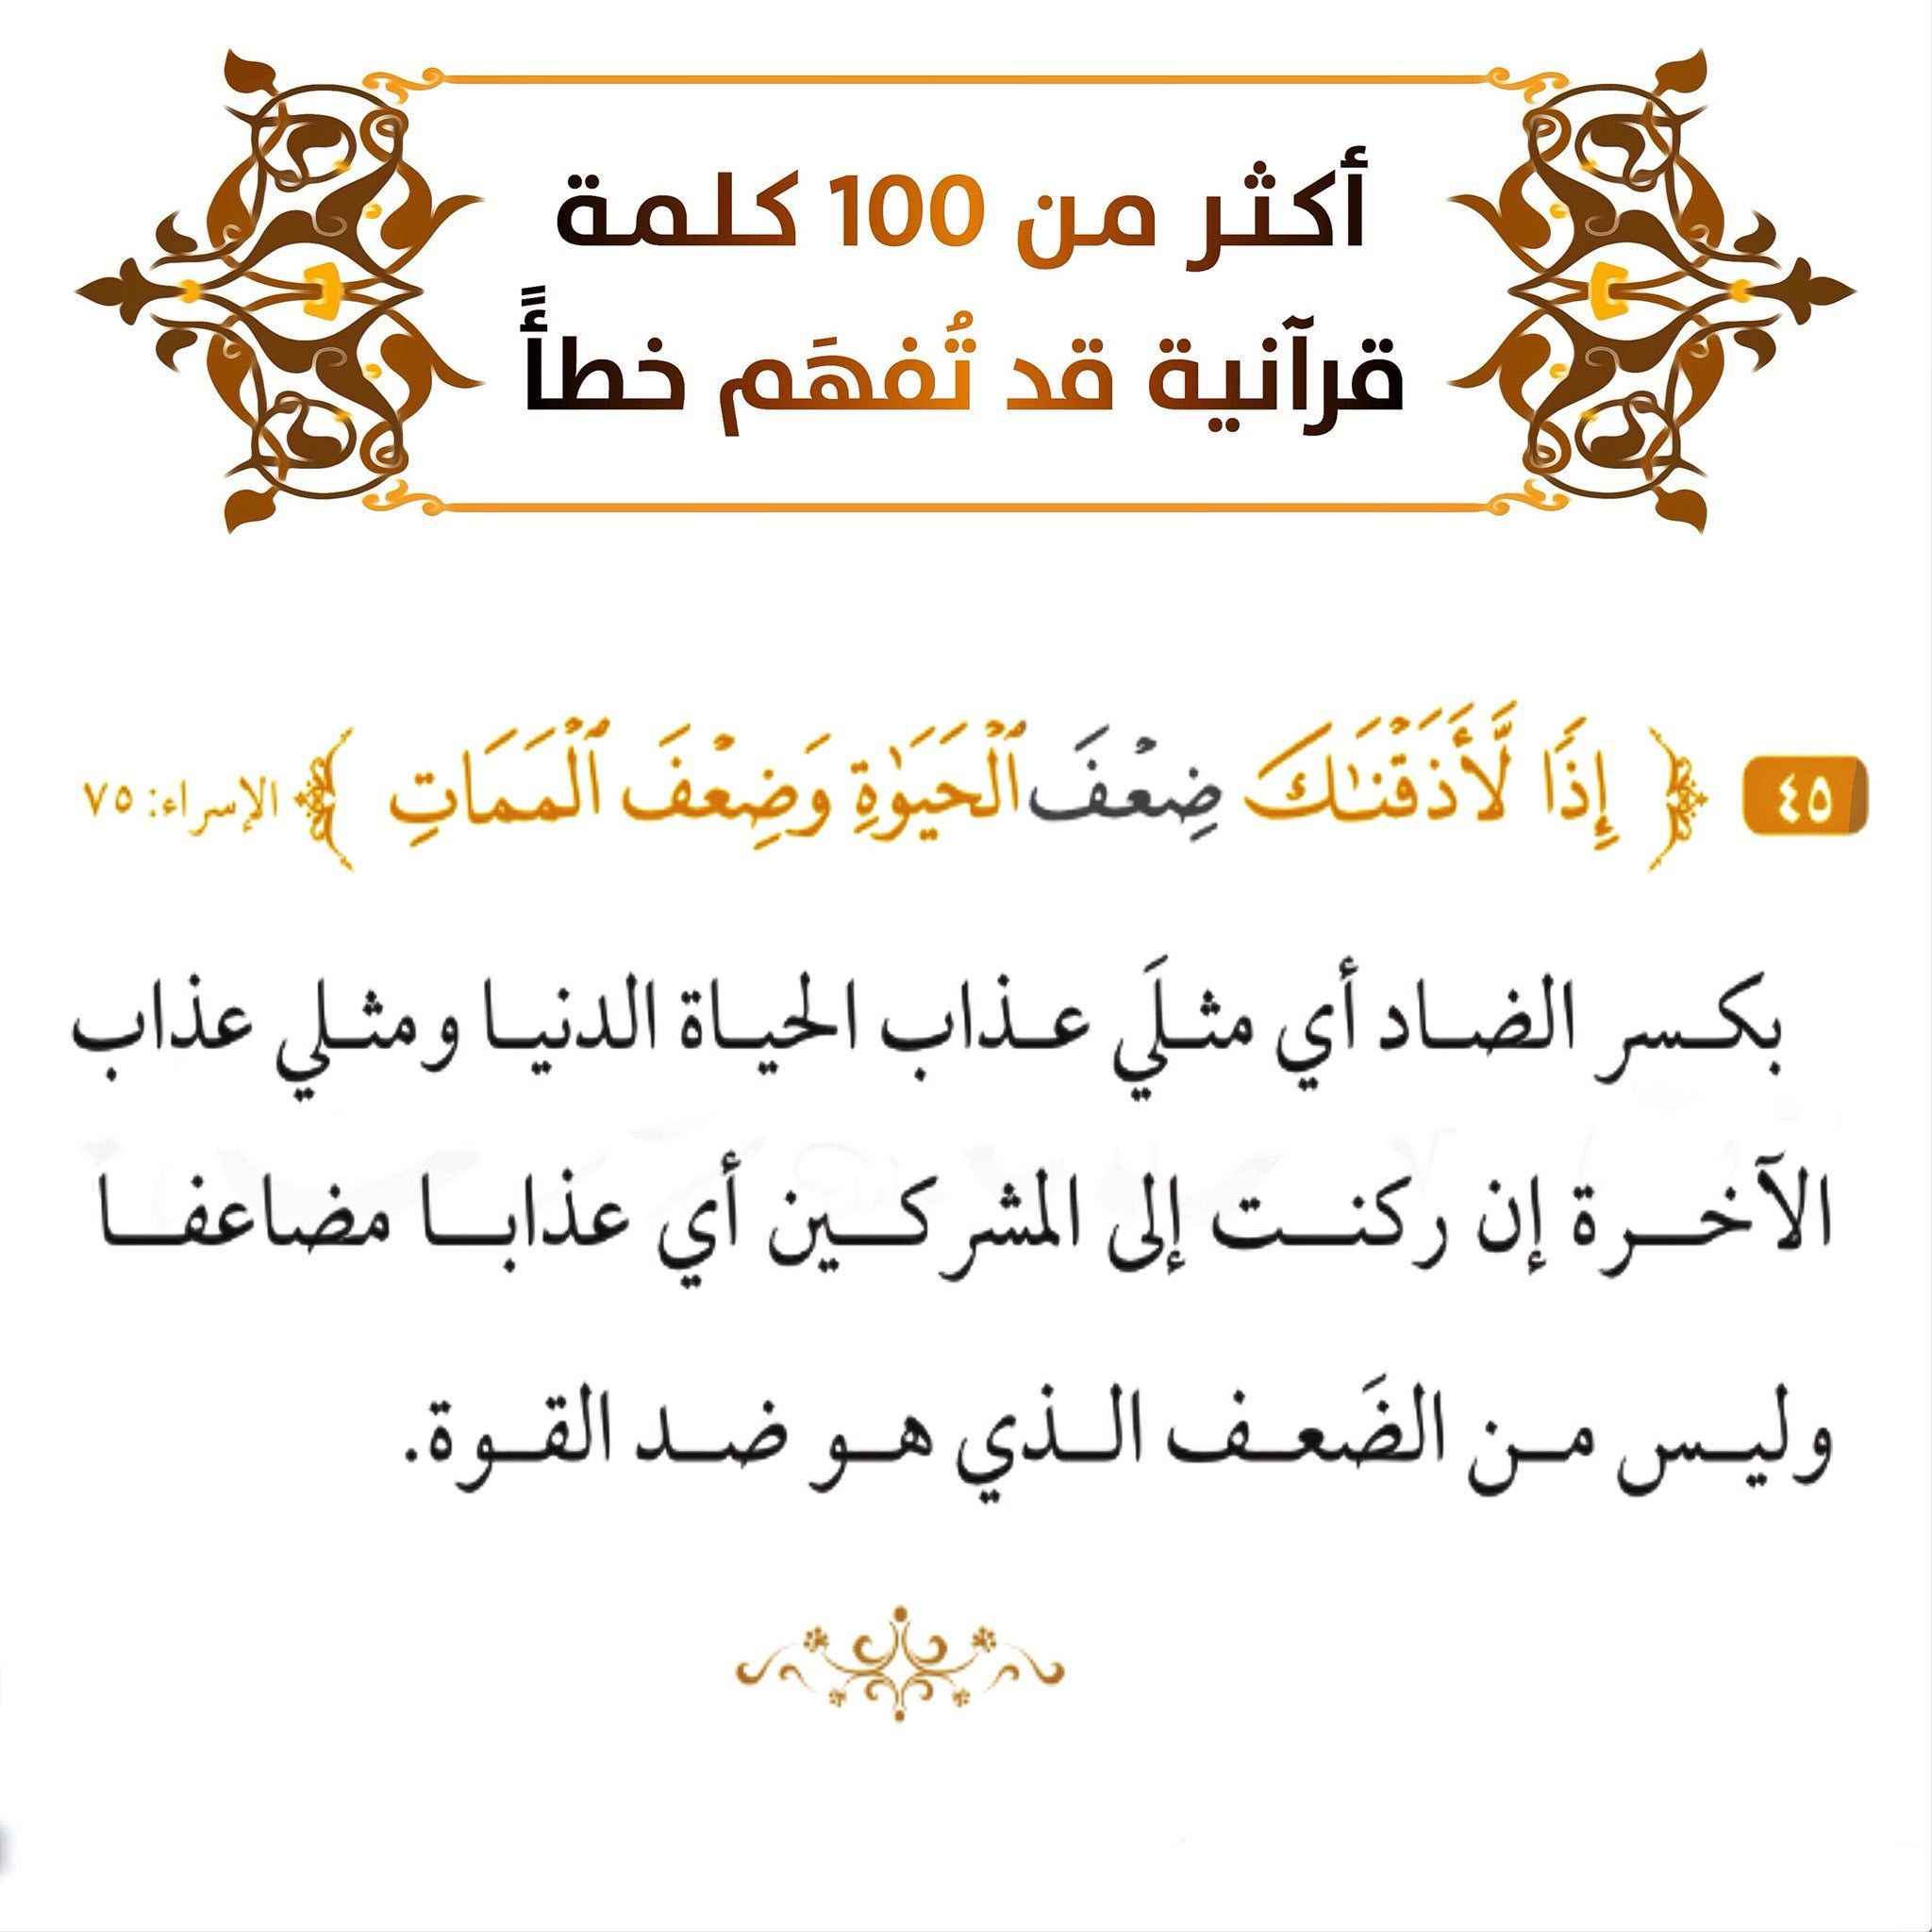 Pin By الأثر الجميل On أكثر من 100 كلمة قرآنية قد تفهم خطأ Quran Verses Beautiful Arabic Words Quran